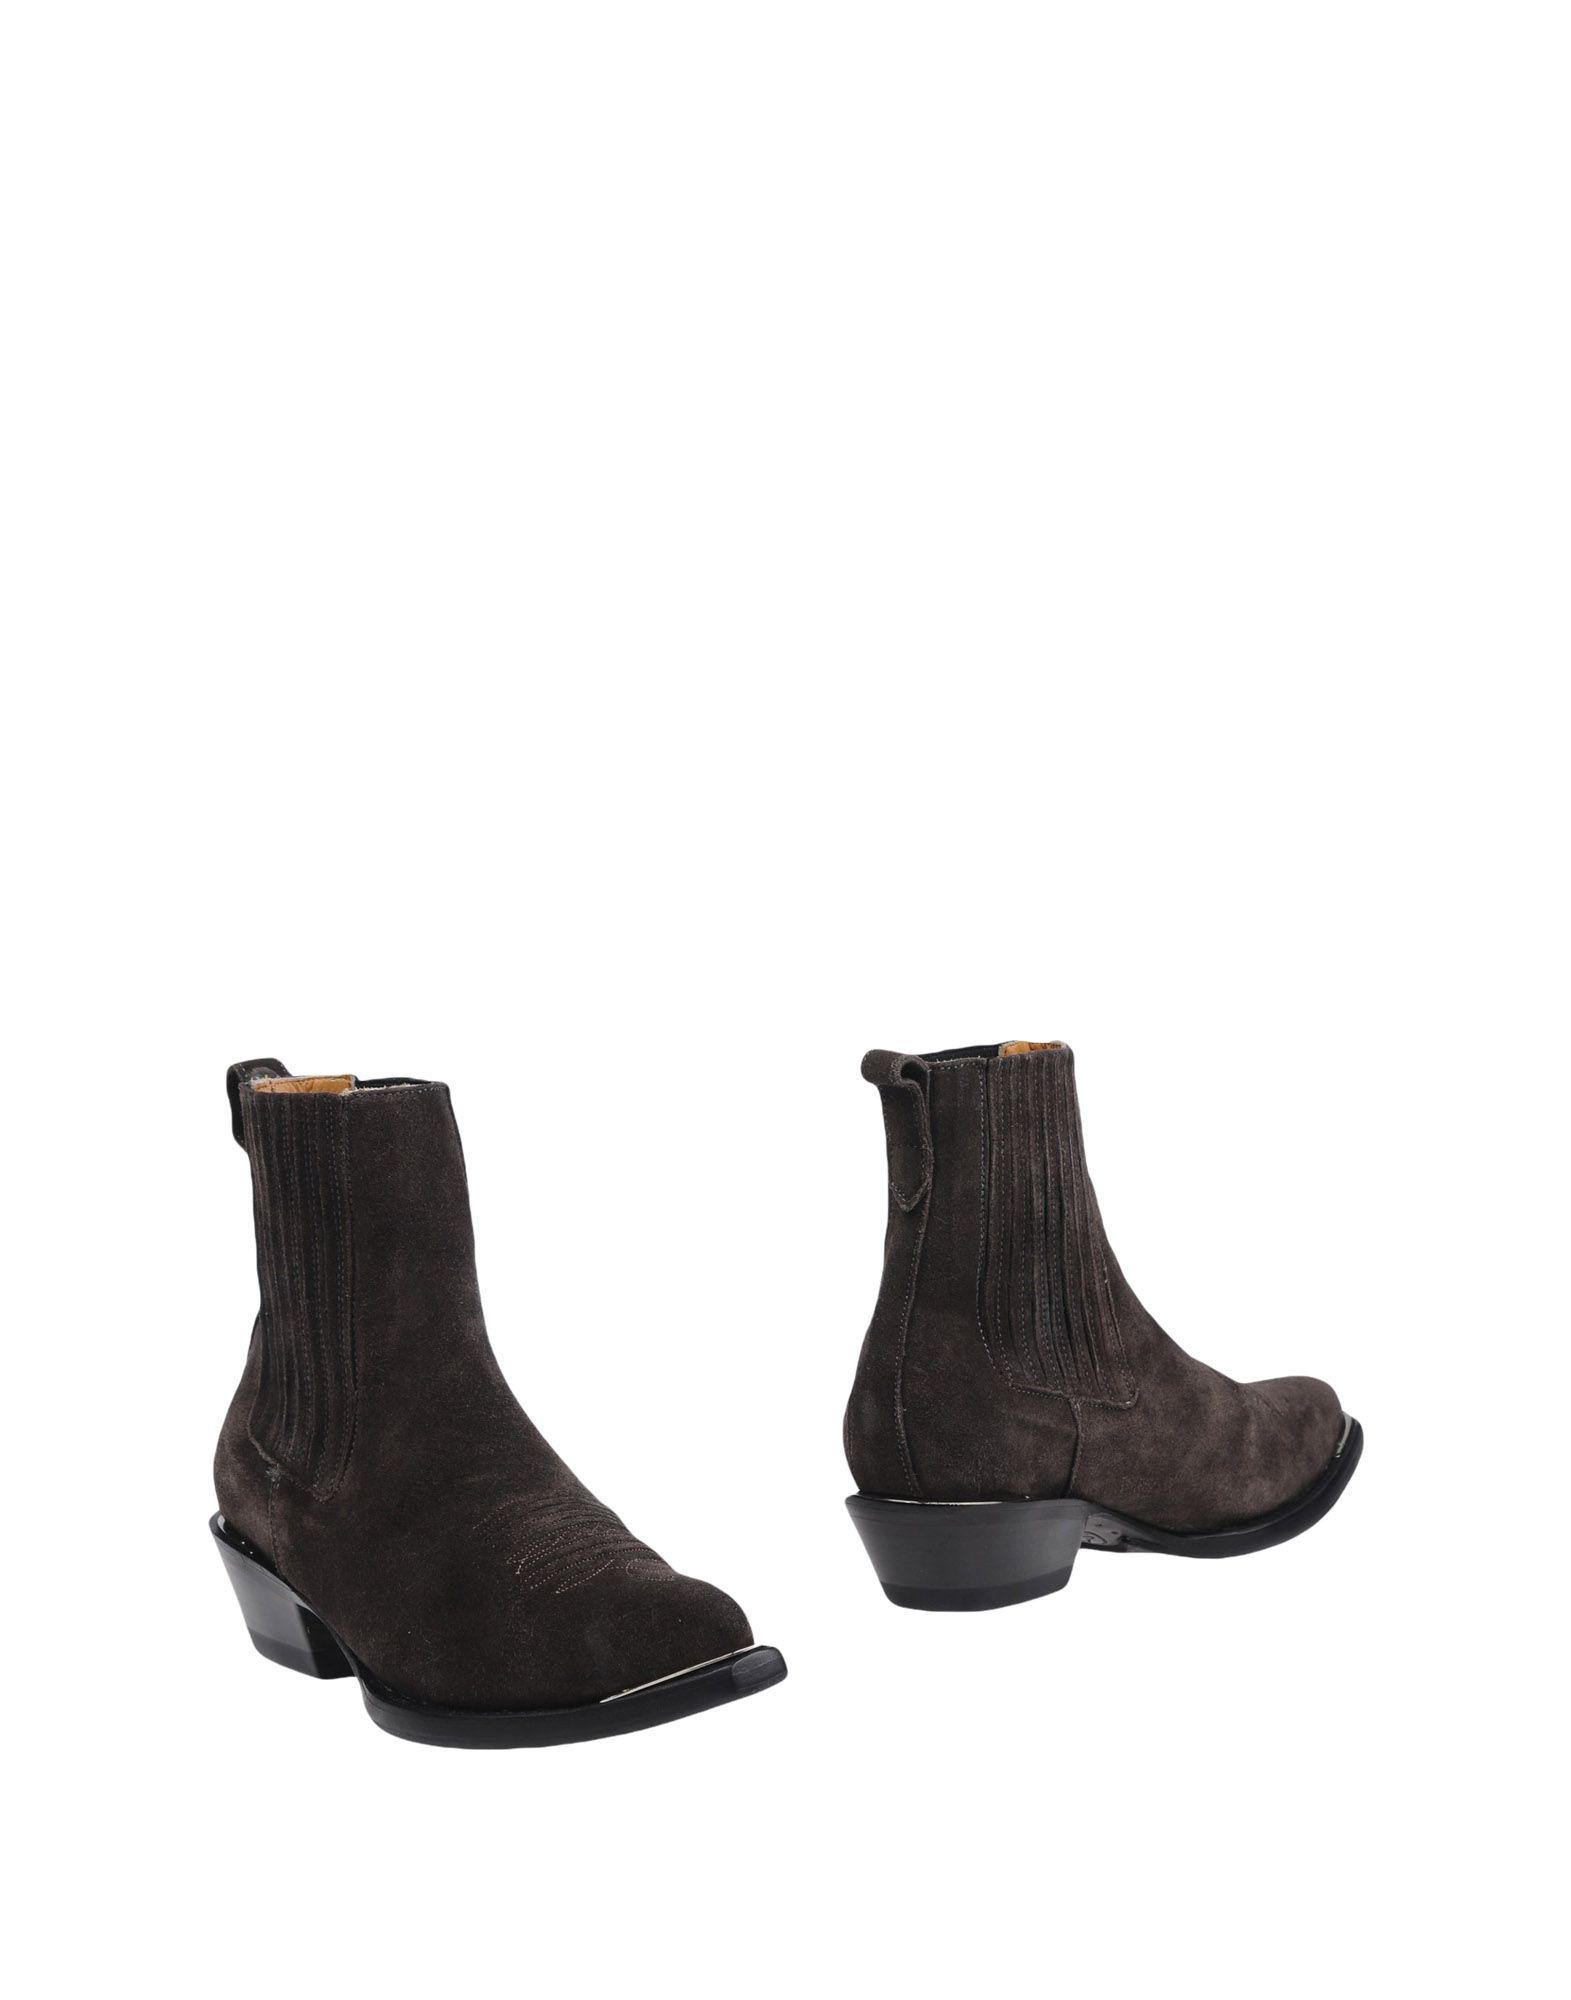 Ash Chelsea Boots Damen Schuhe  11230314ODGut aussehende strapazierfähige Schuhe Damen aeb5fa